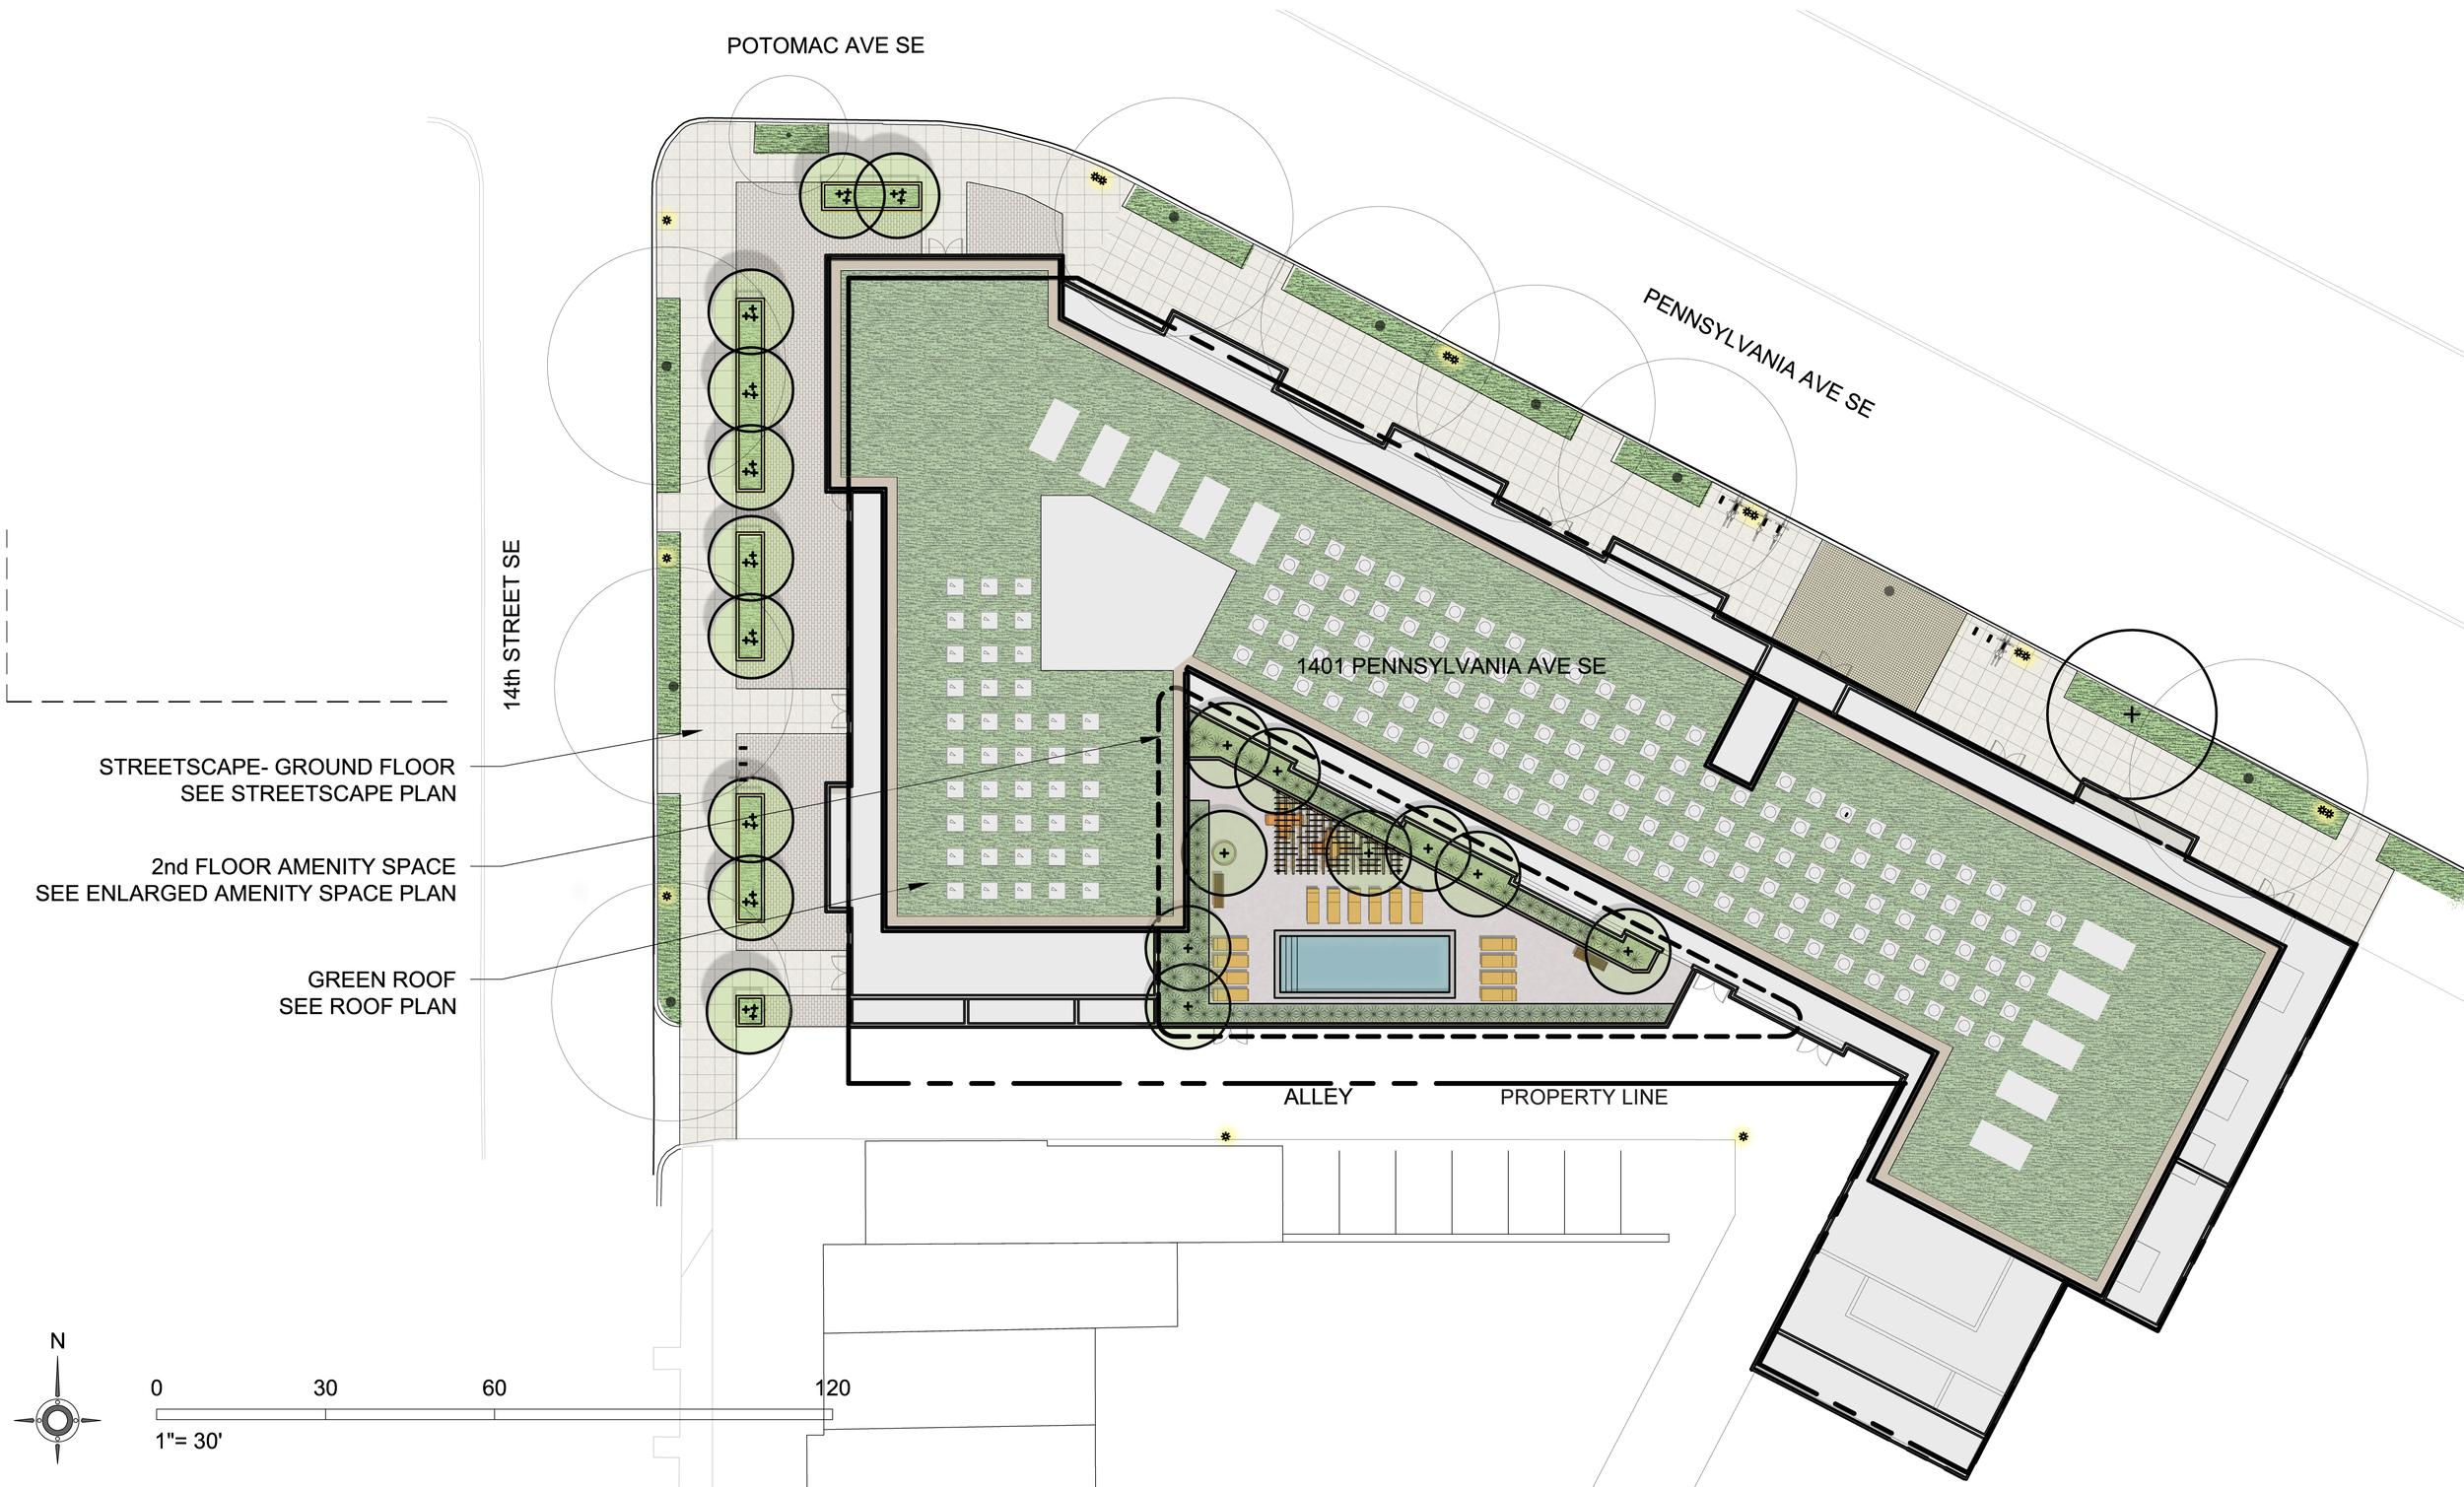 Project Location:  Washington, DC (Capitol Hill)   Project Developer:  CAS Riegler   Project Architect:  Antunovich Associates   Image By:  Moody Landscape Architecture